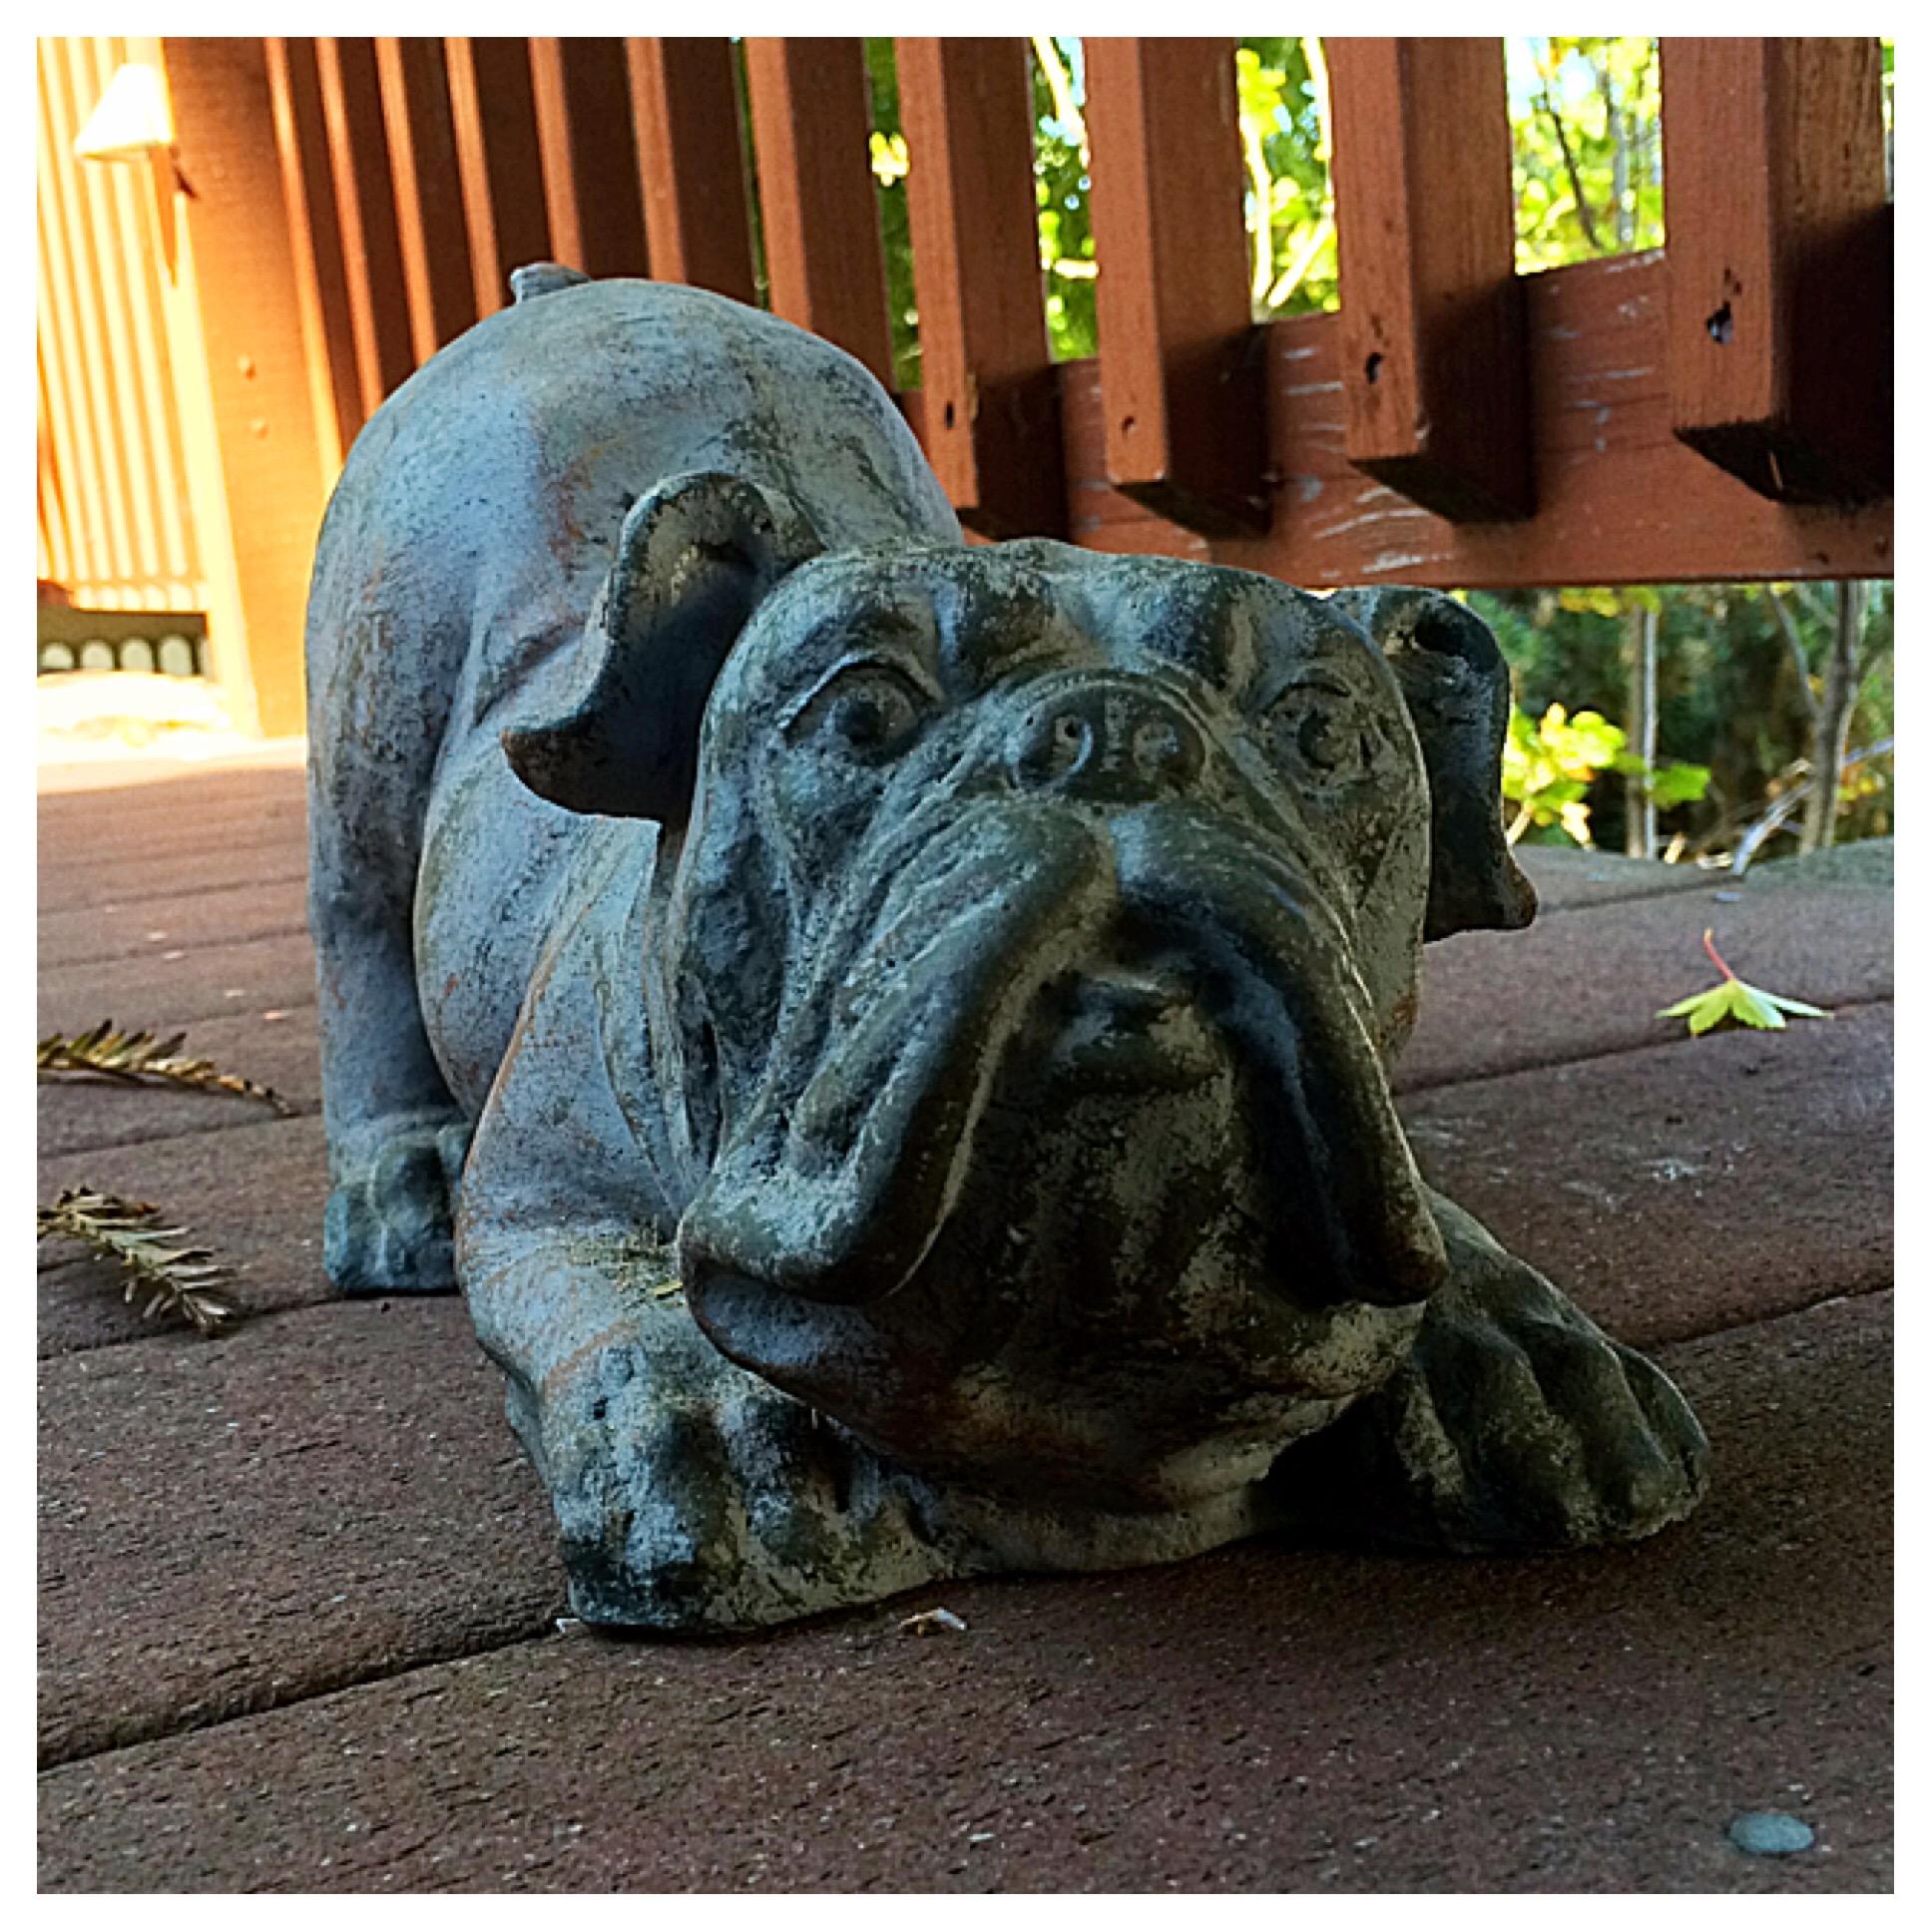 Cookie's backyard statue